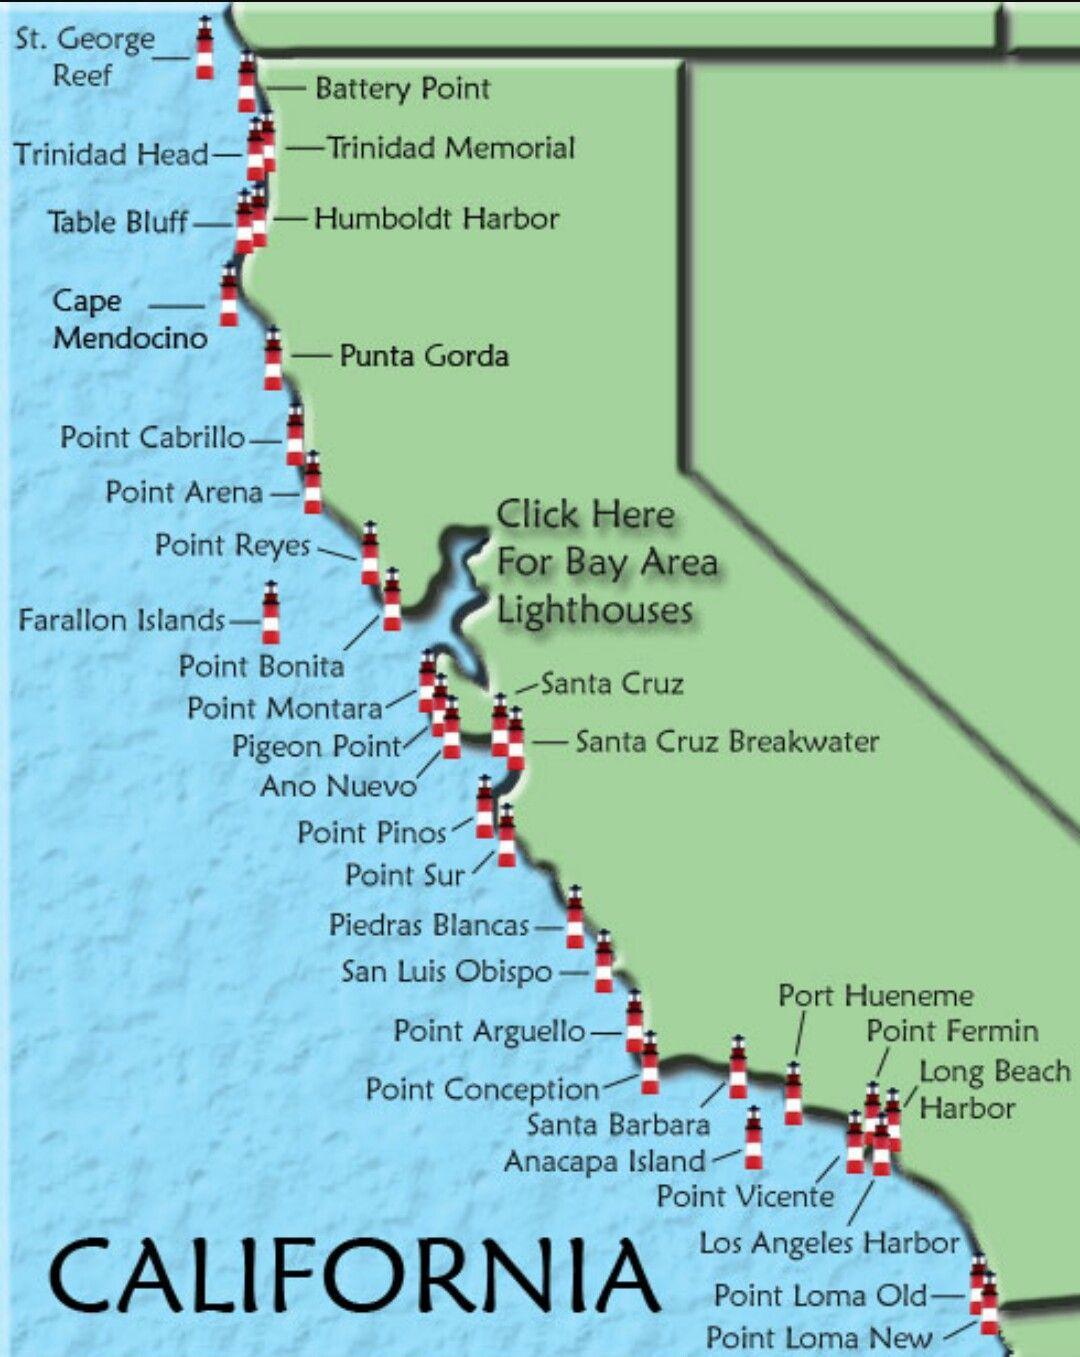 Cfcedabadcfeb Valid Map Of Northern California Beaches Map - Klipy - California Beaches Map